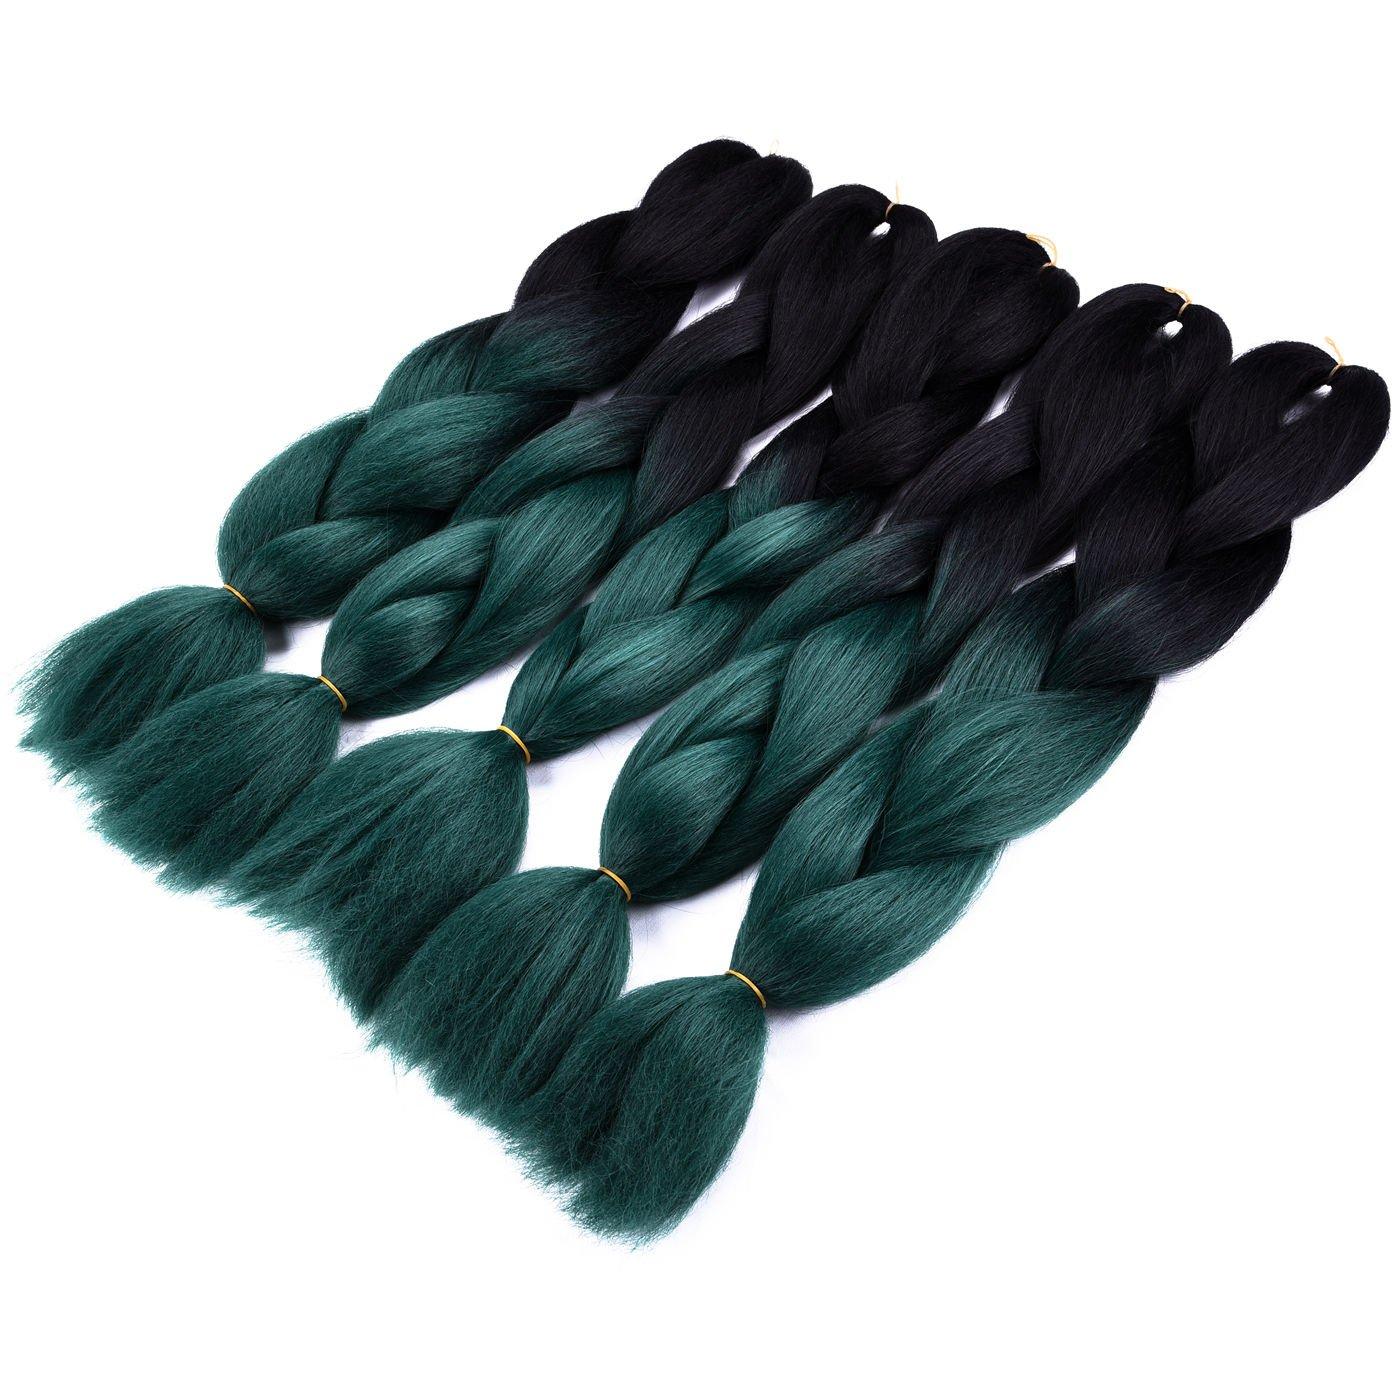 Silike Jumbo Braids Hair Extensions (5 Pieces) 24'' Ombre Jumbo Braiding Hair For Women (Black/Dark Green)